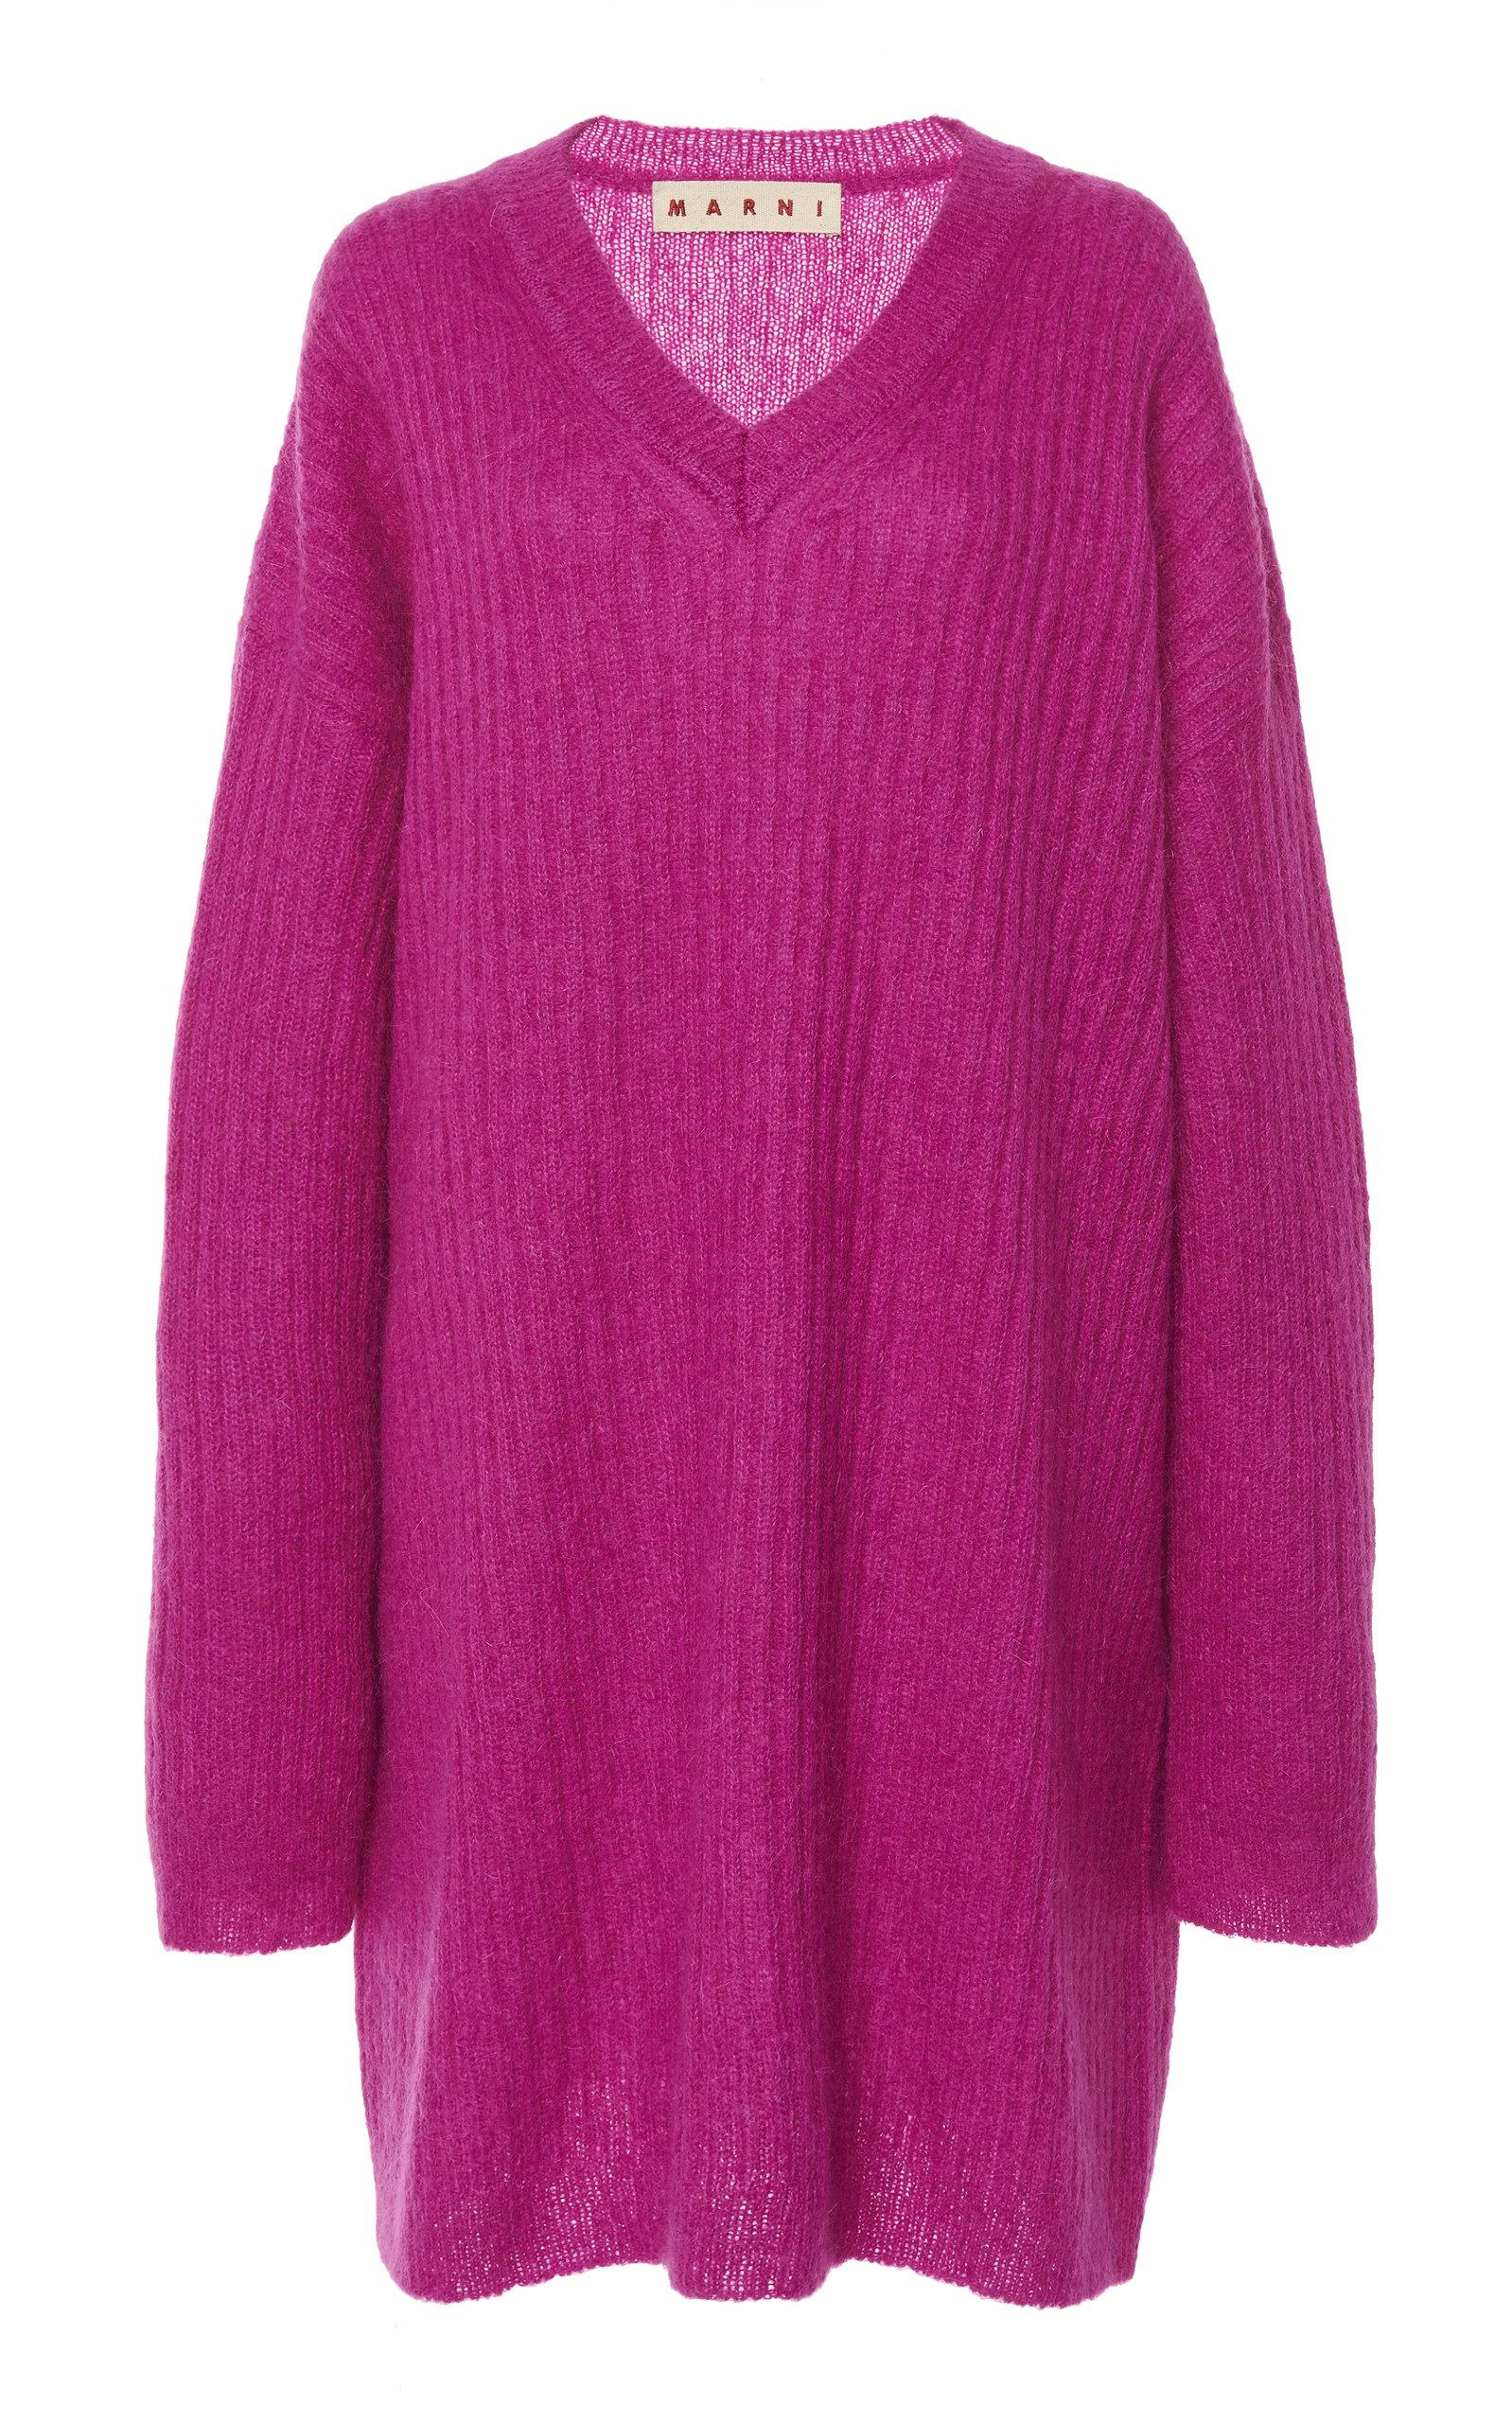 55a95944bd6554 Oversized Ribbed-Knit Mohair-Blend Sweater by Marni   Moda Operandi